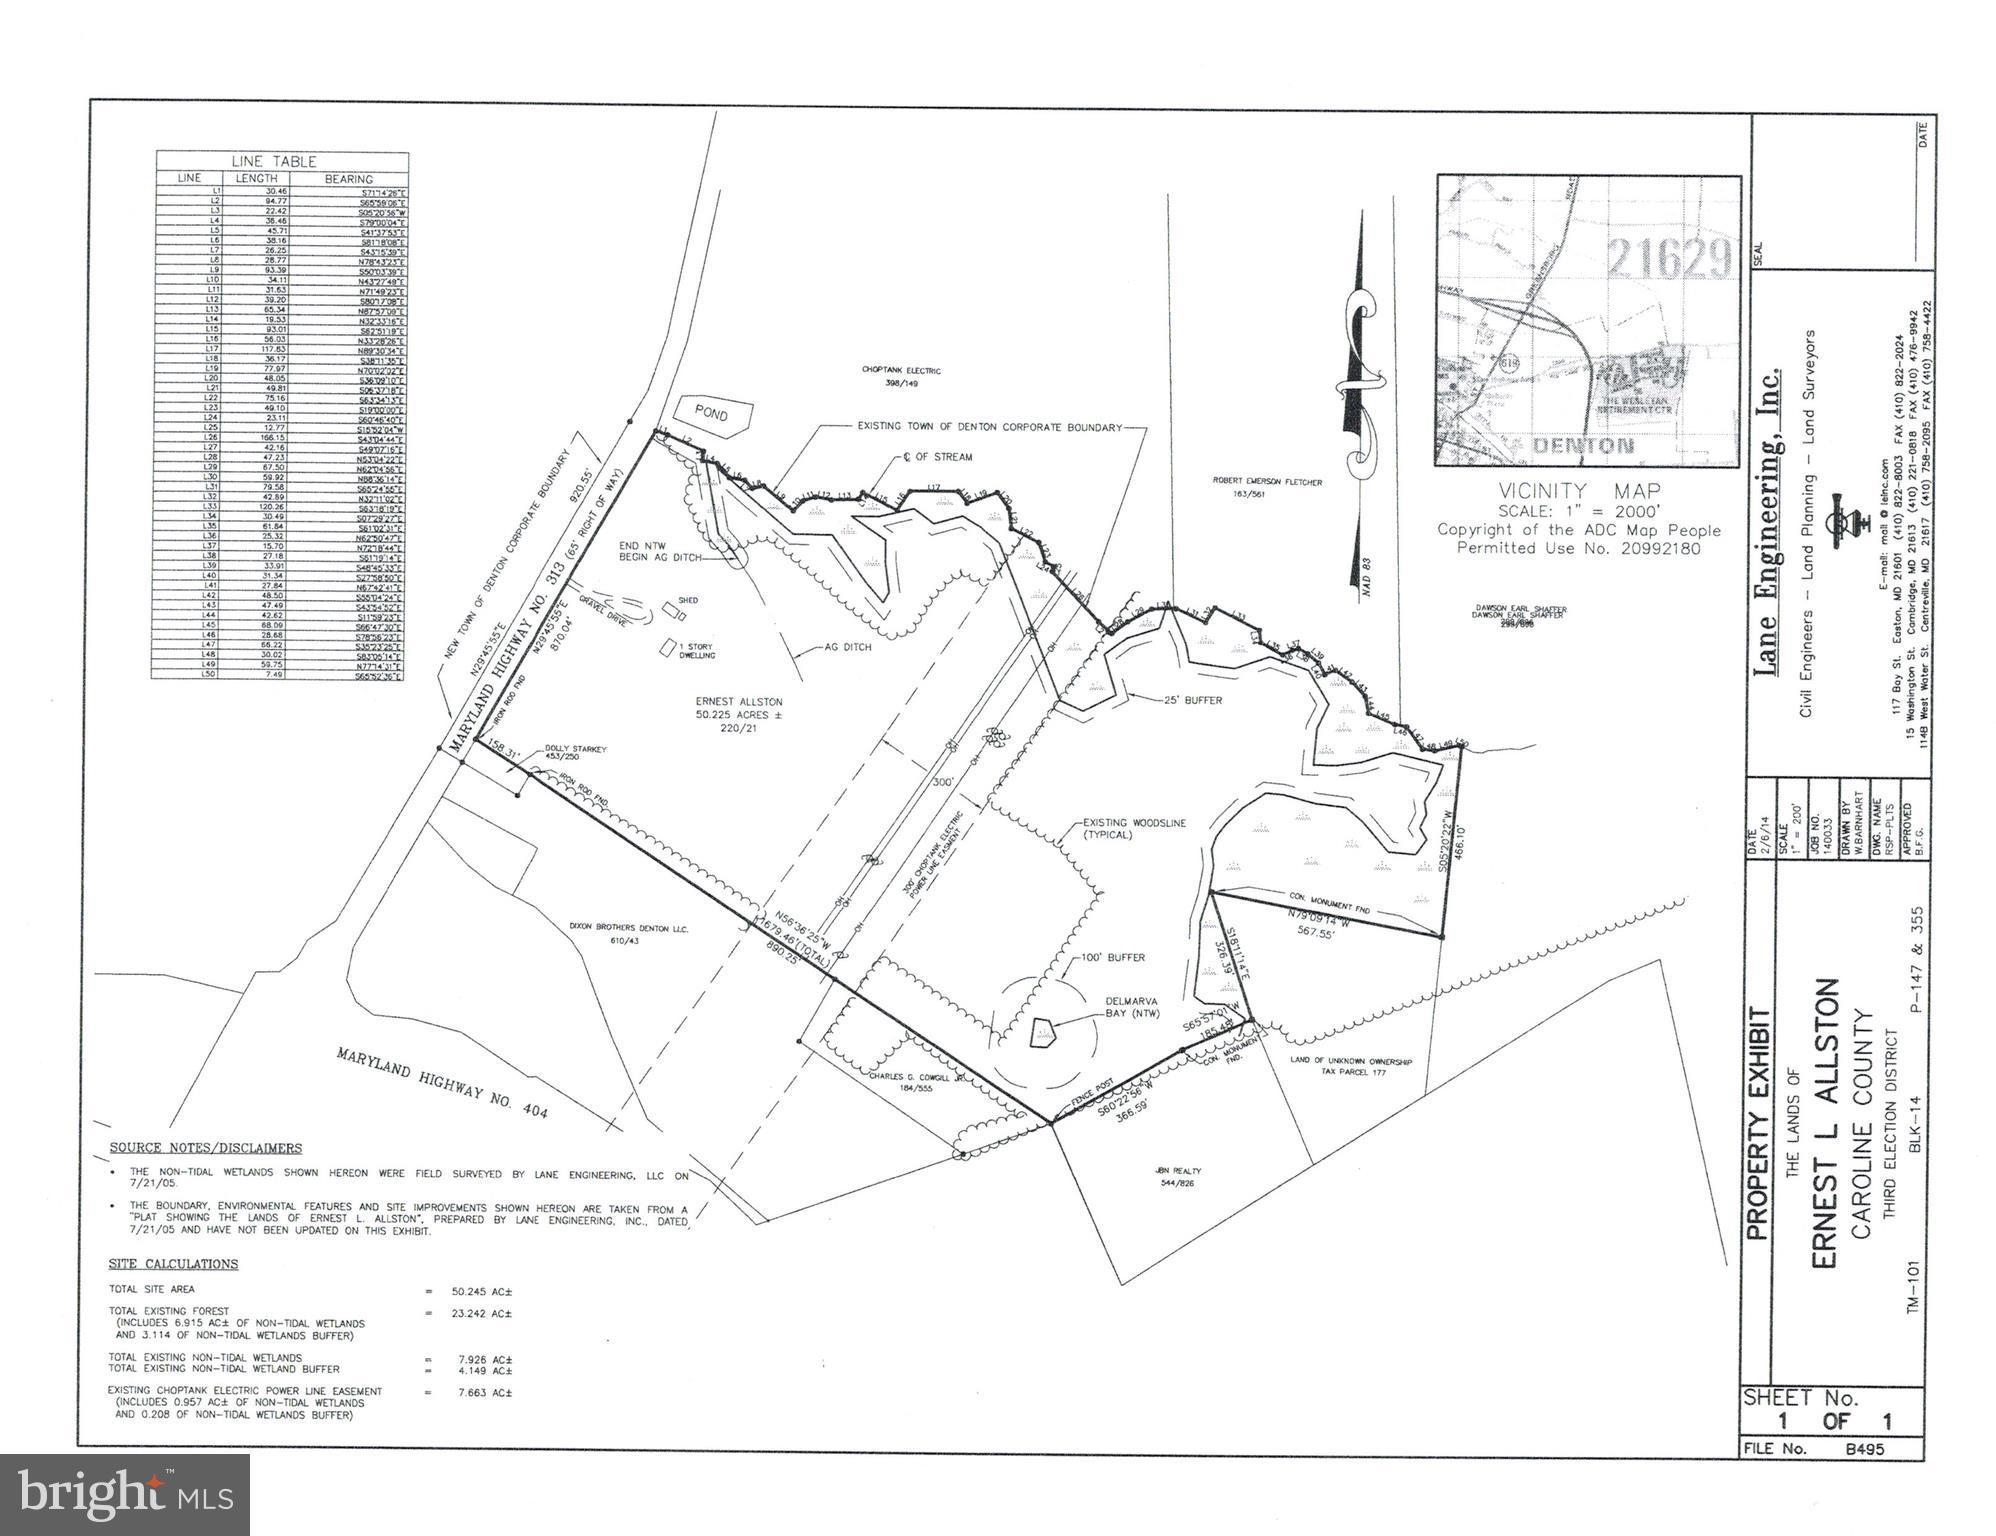 10591 GREENBORO ROAD, DENTON, MD 21629